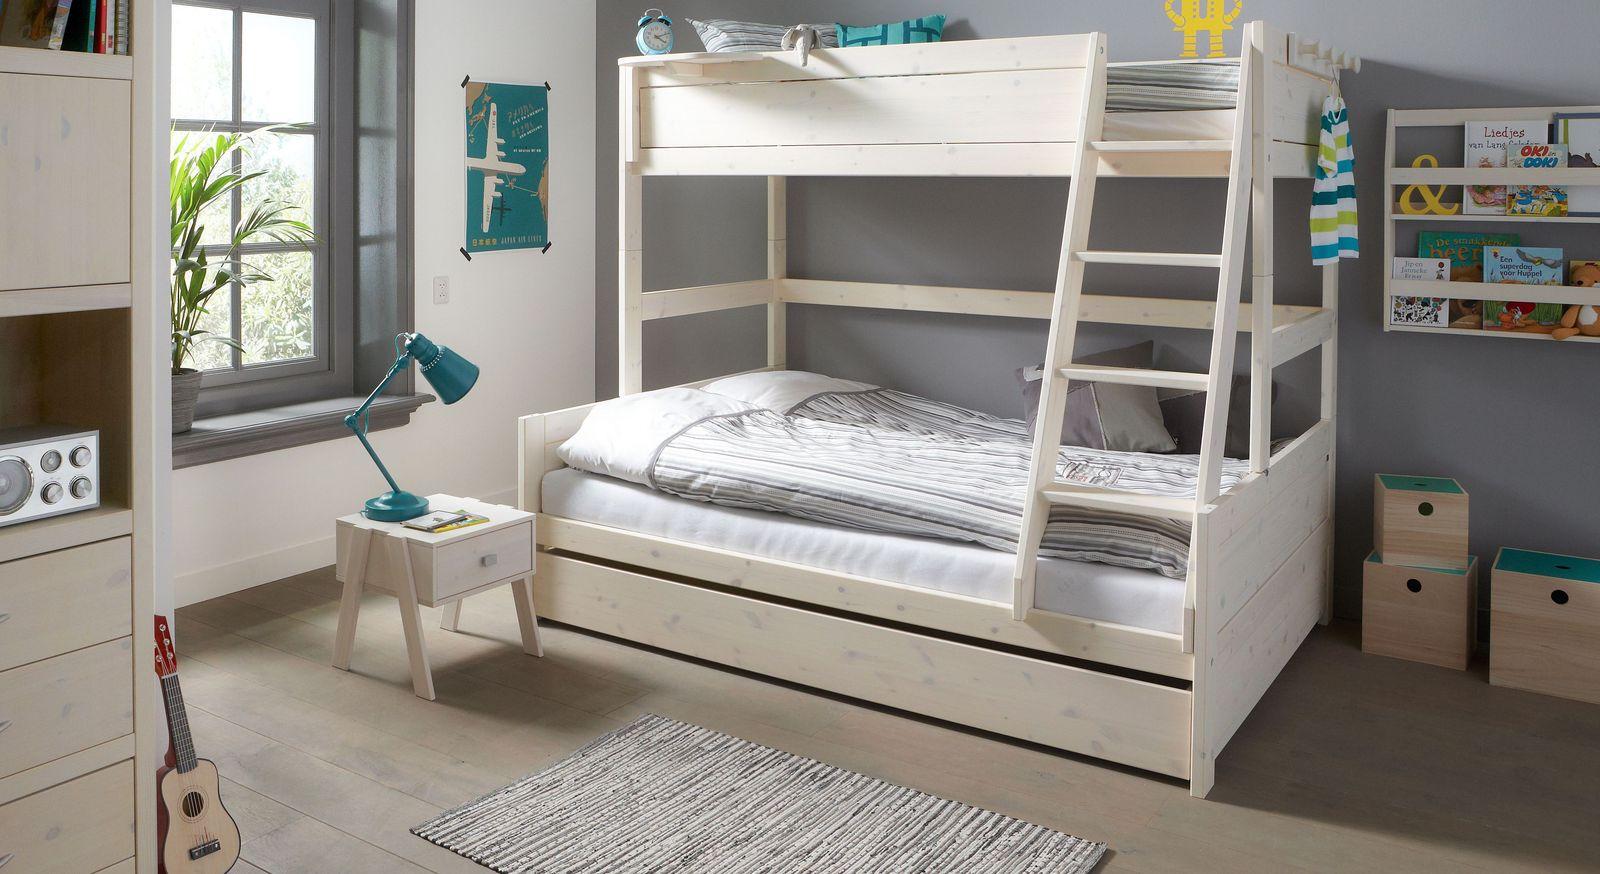 LIFETIME Familienbett Original aus weiß lasiertem Massivholz